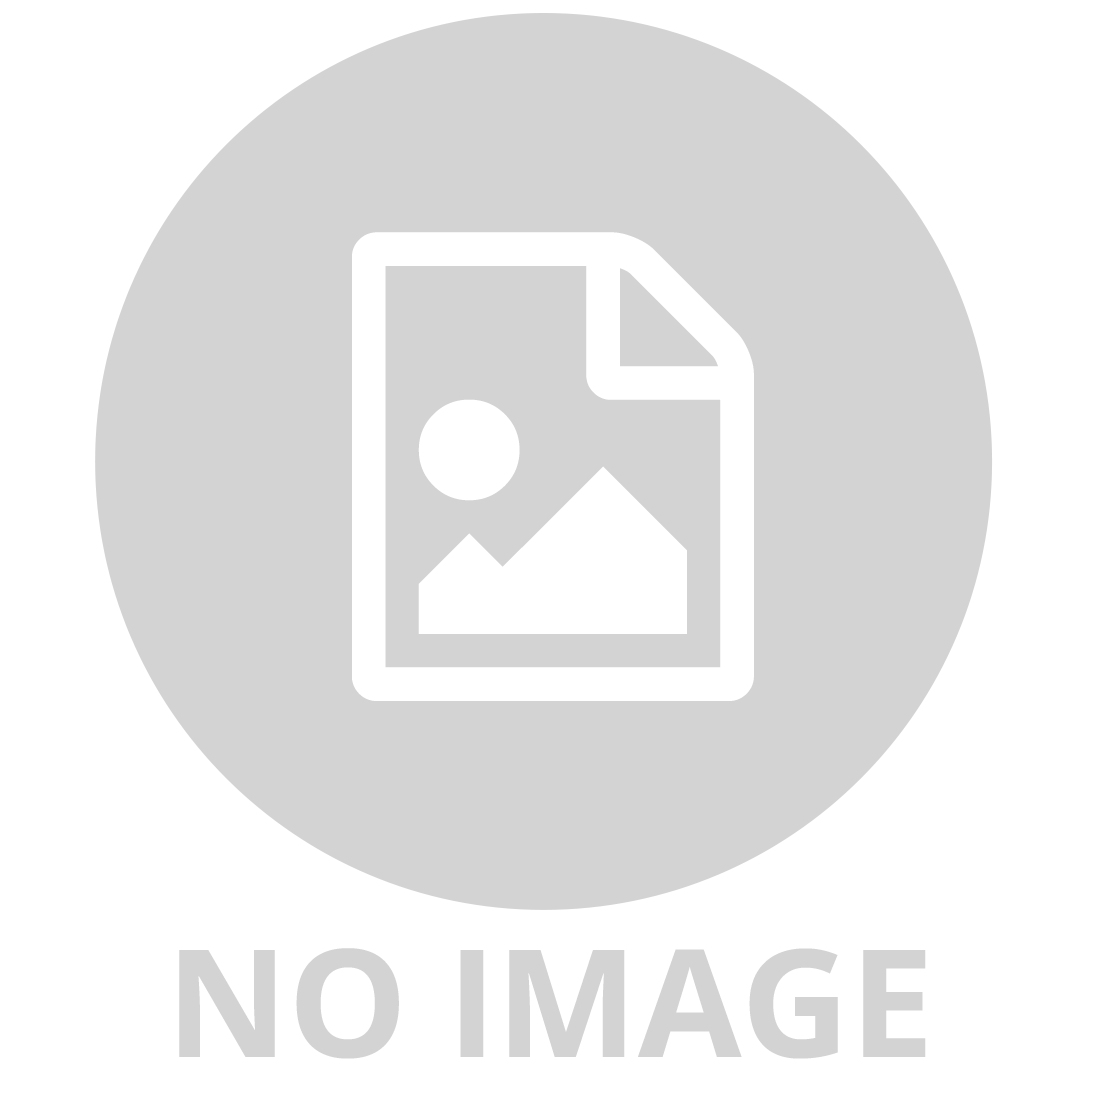 CREATE YOUR CRAZY FARM 400 STICKERS